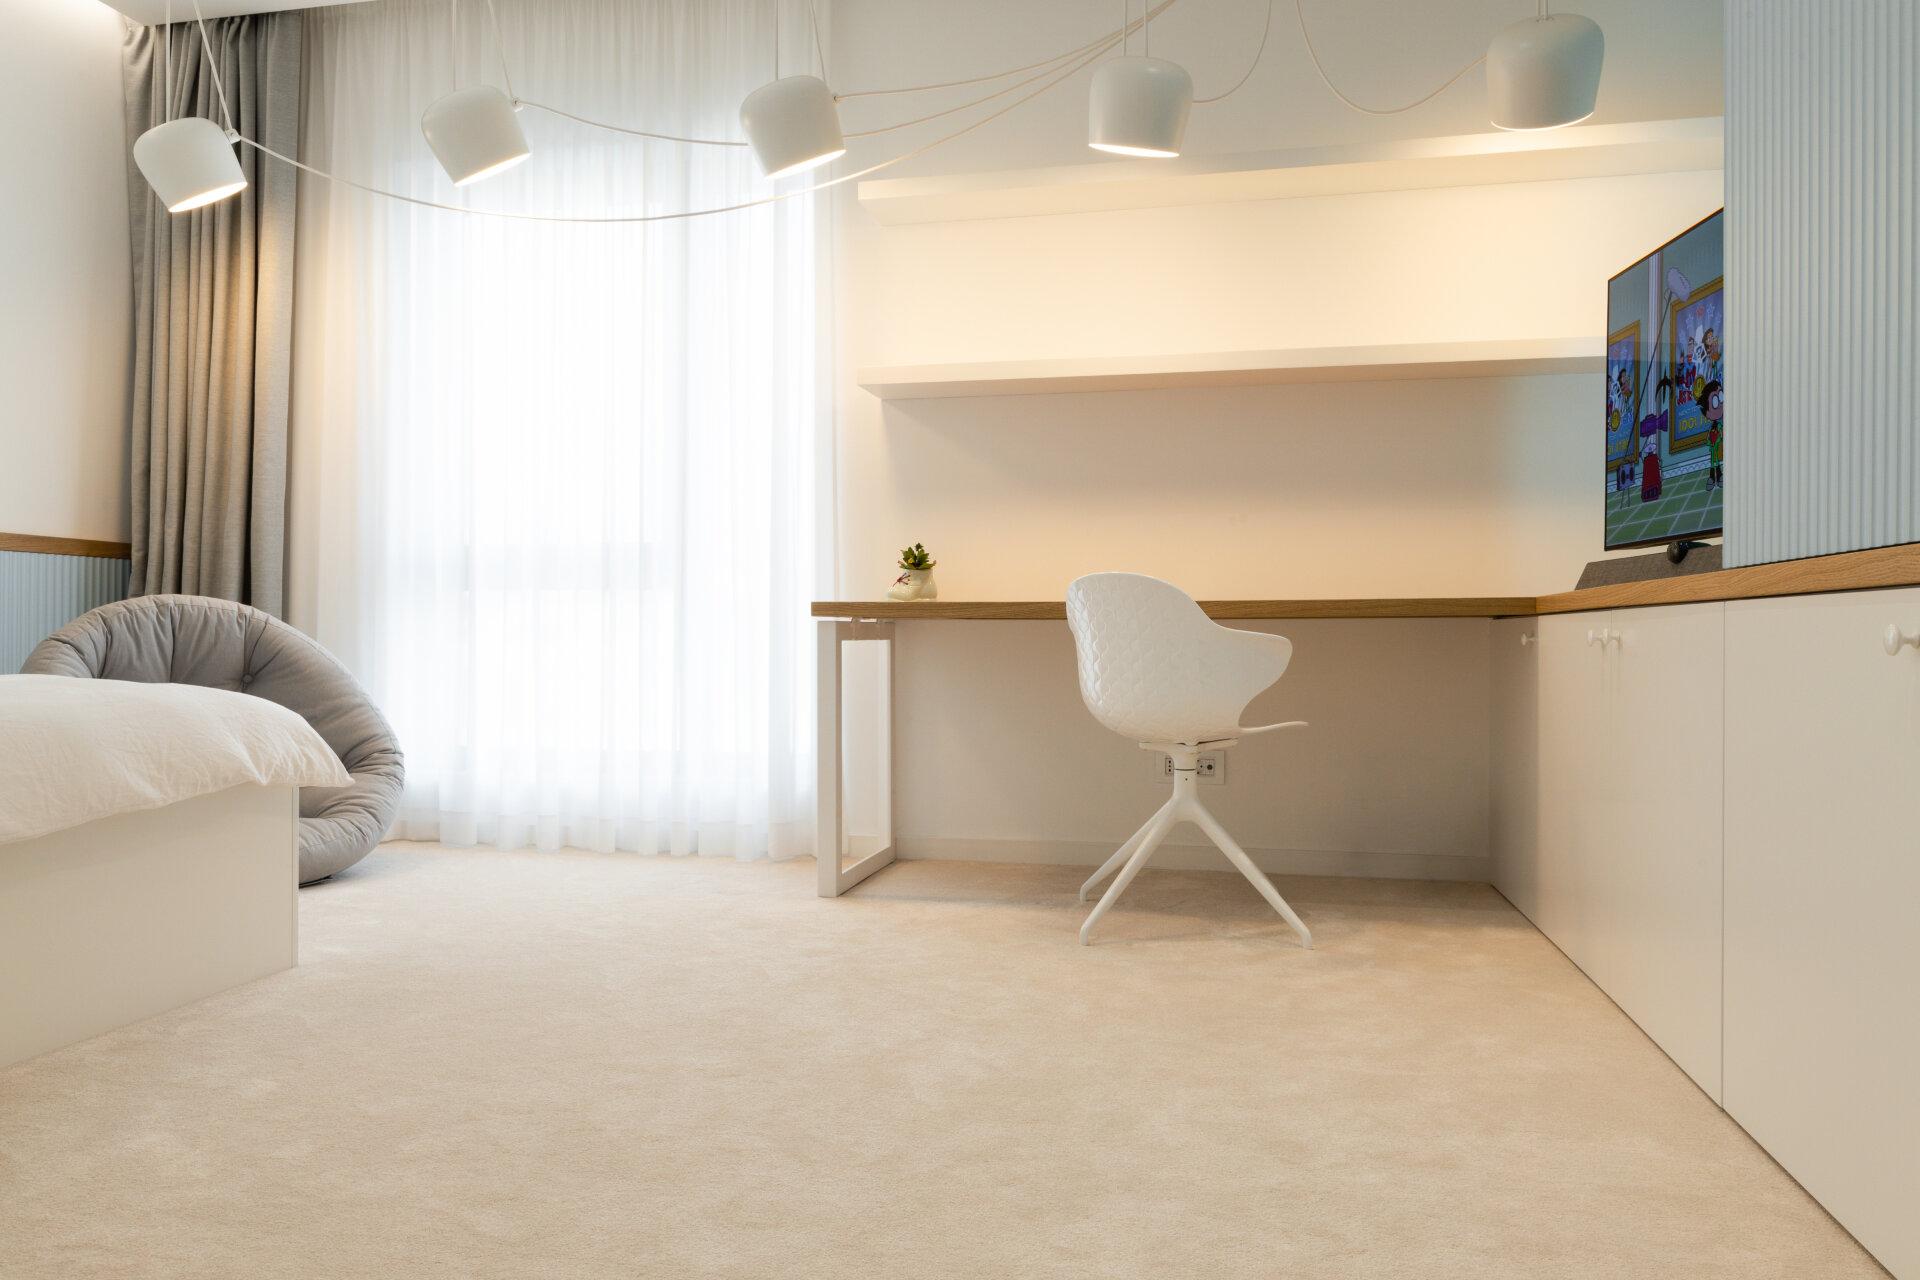 20210303-carpet&more-vila-bogdan-craiova-by-hugmedia-24